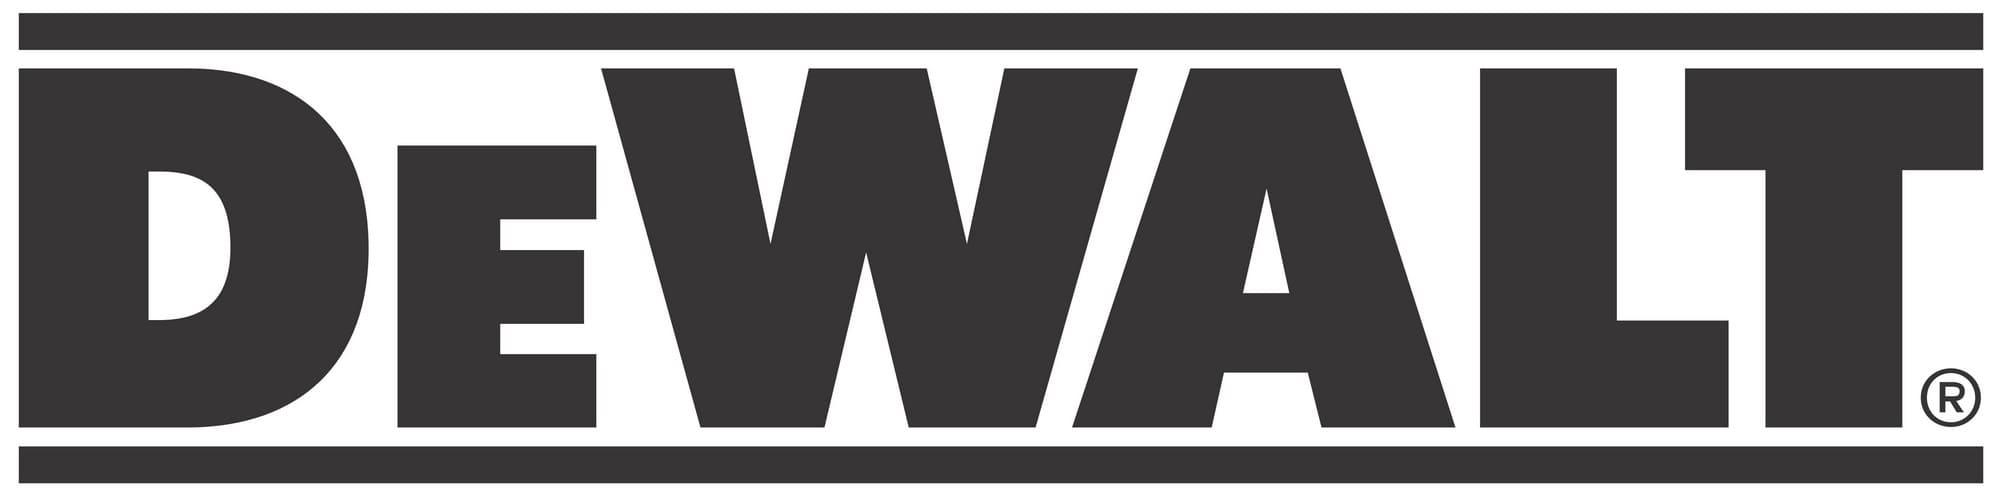 DeWalt Logo [PDF] Download Vector.